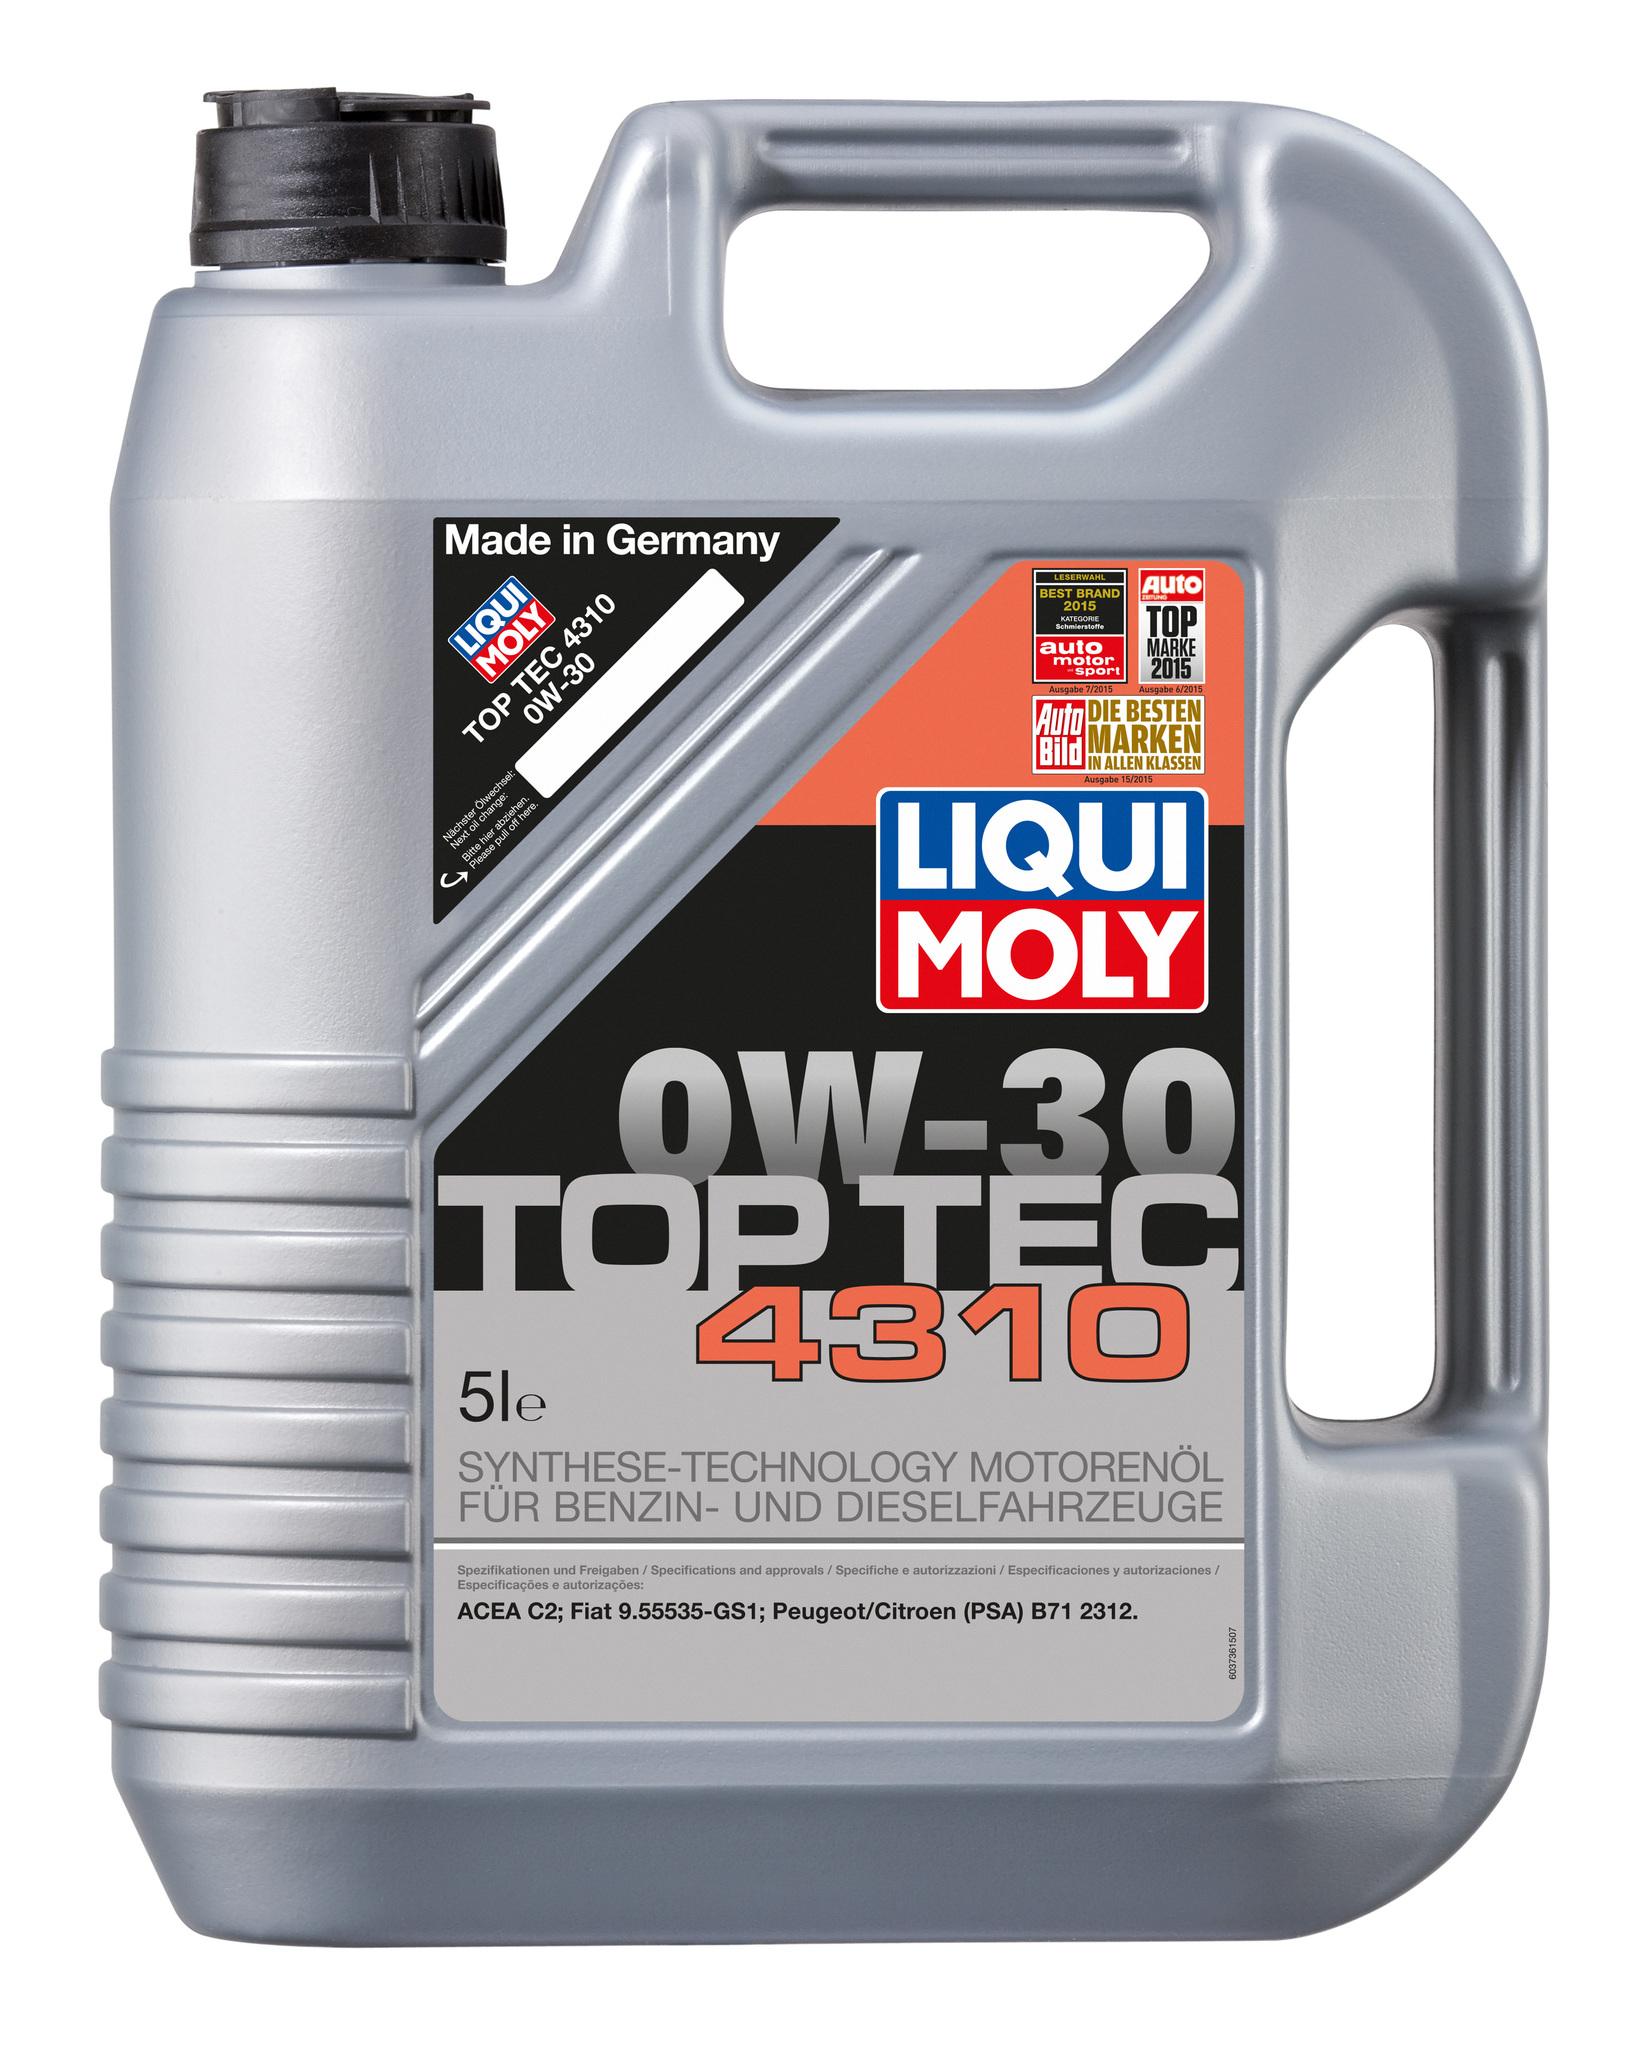 Liqui Moly Top Tec 4310 0W30 Синтетическое моторное масло (2362)